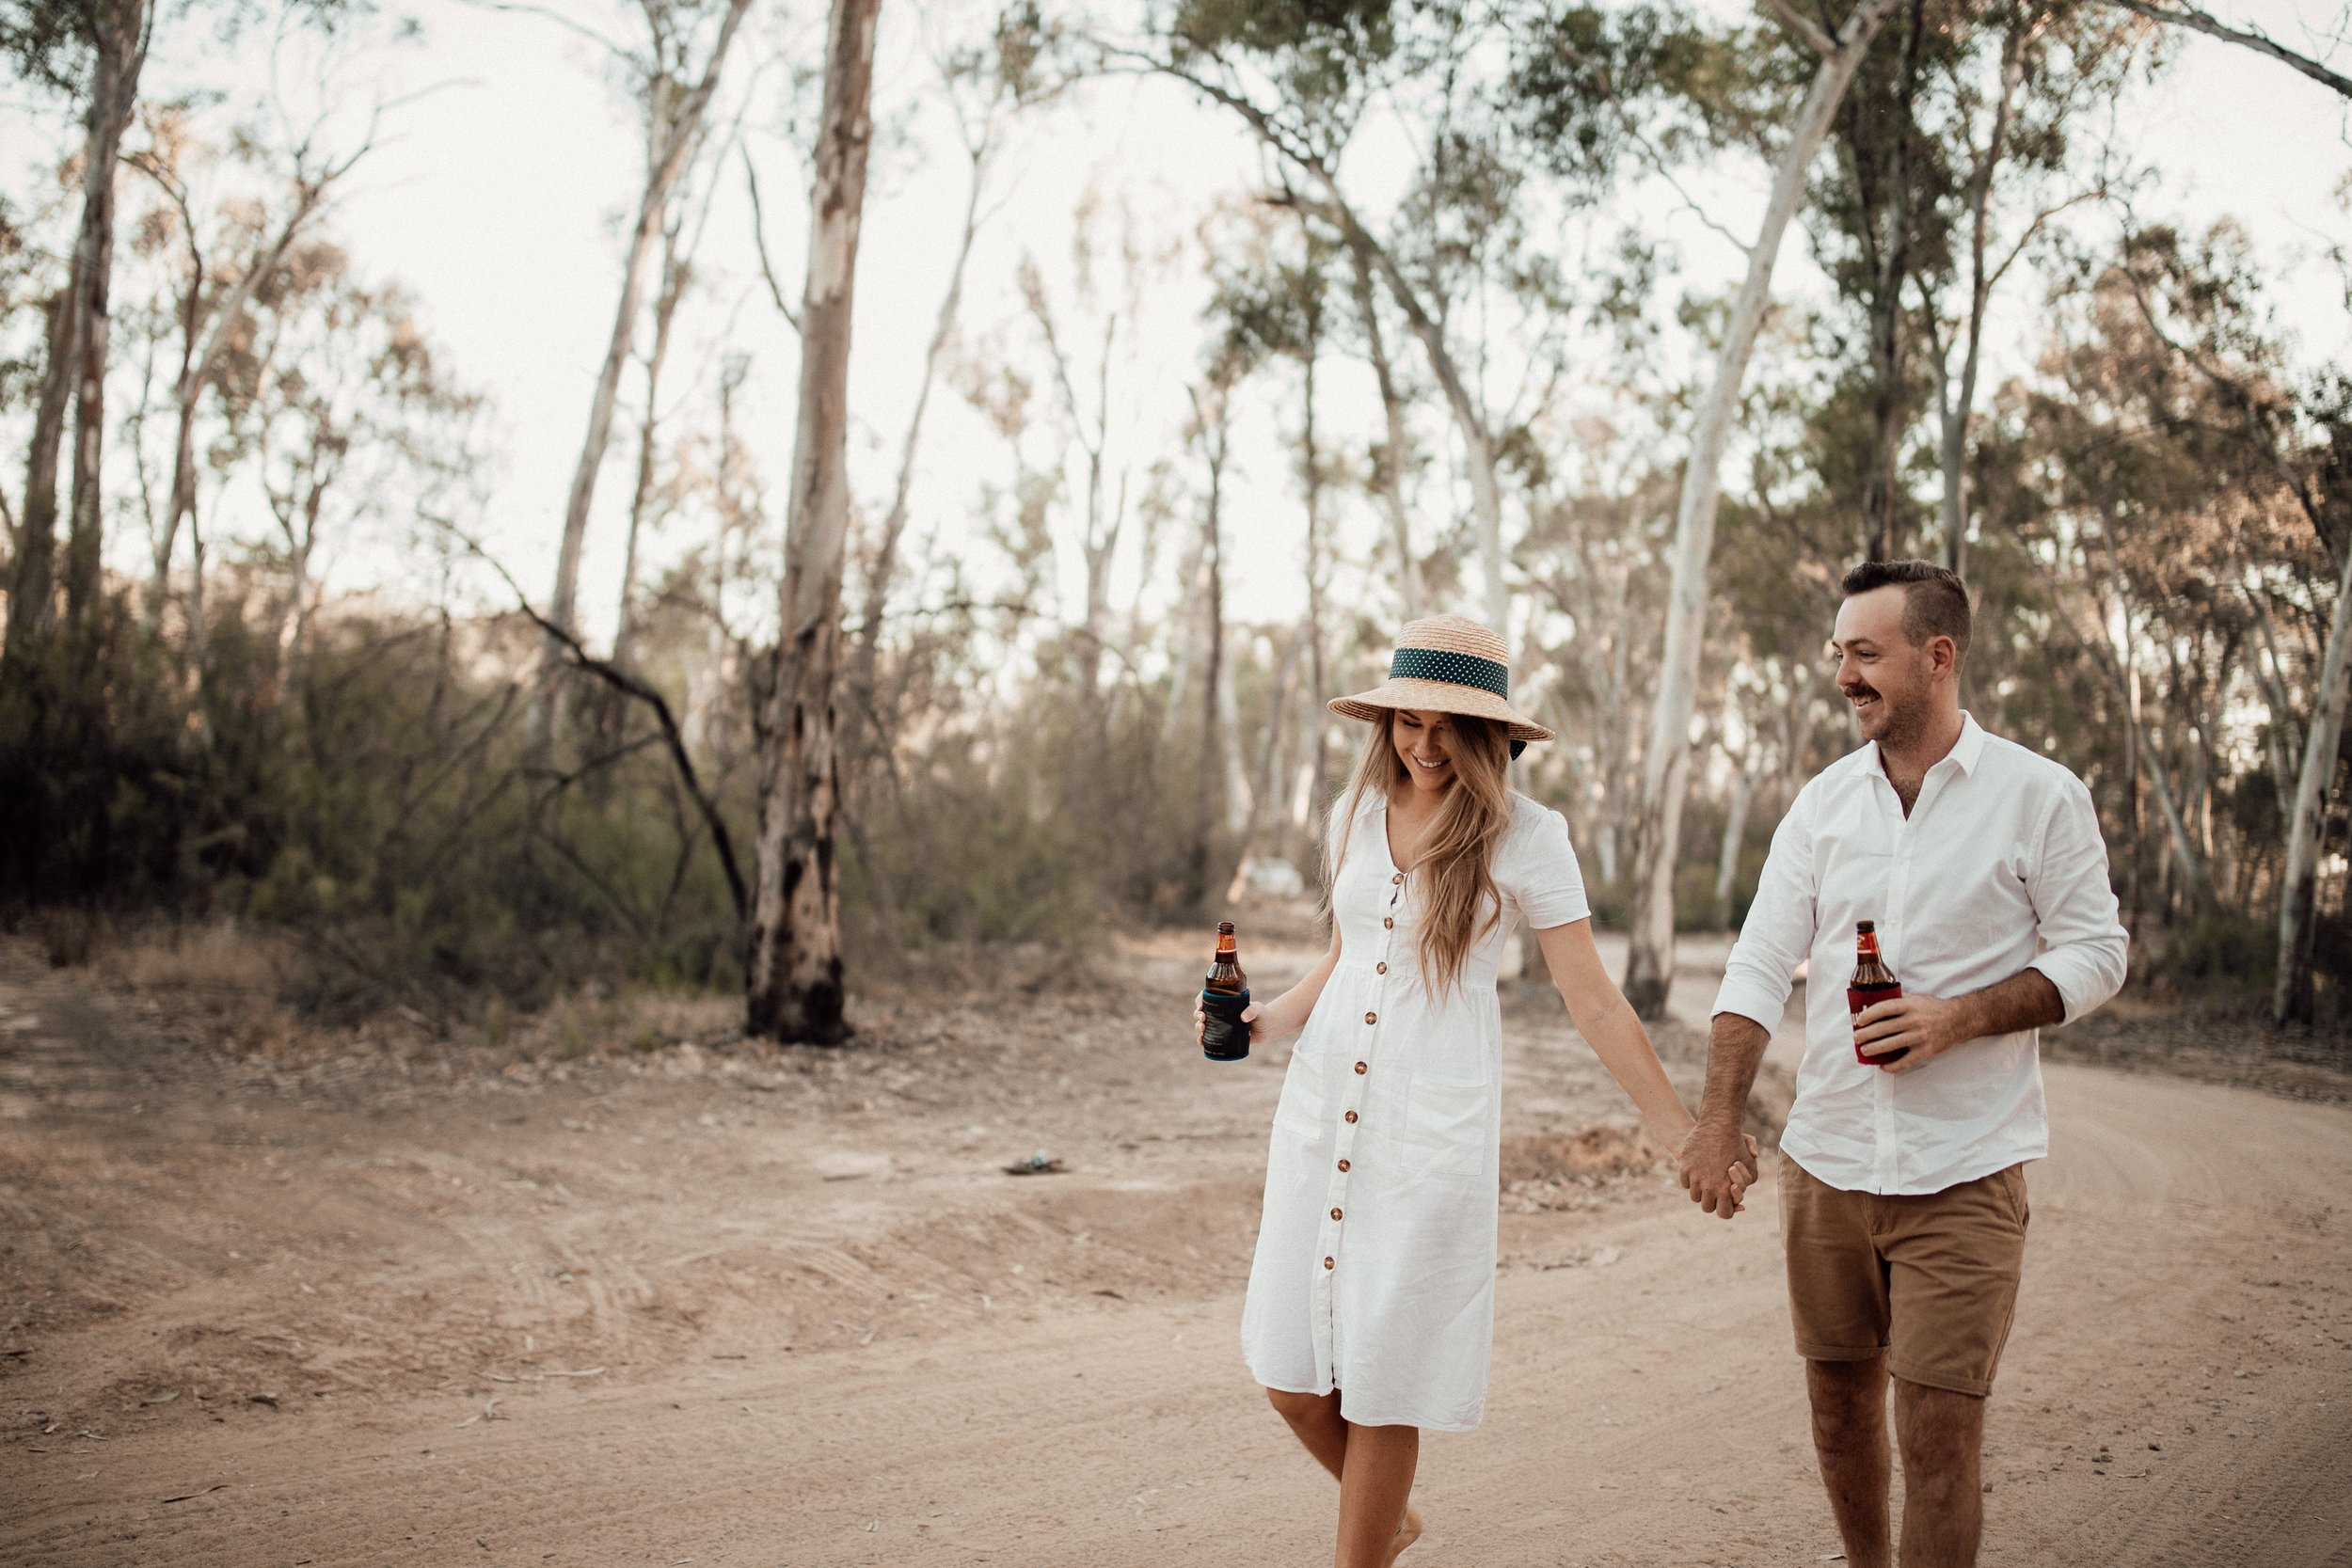 mickalathomas_puremacphotography_weddingphotographer_couplephotographer_Sheppartonphotographer_1495.jpg